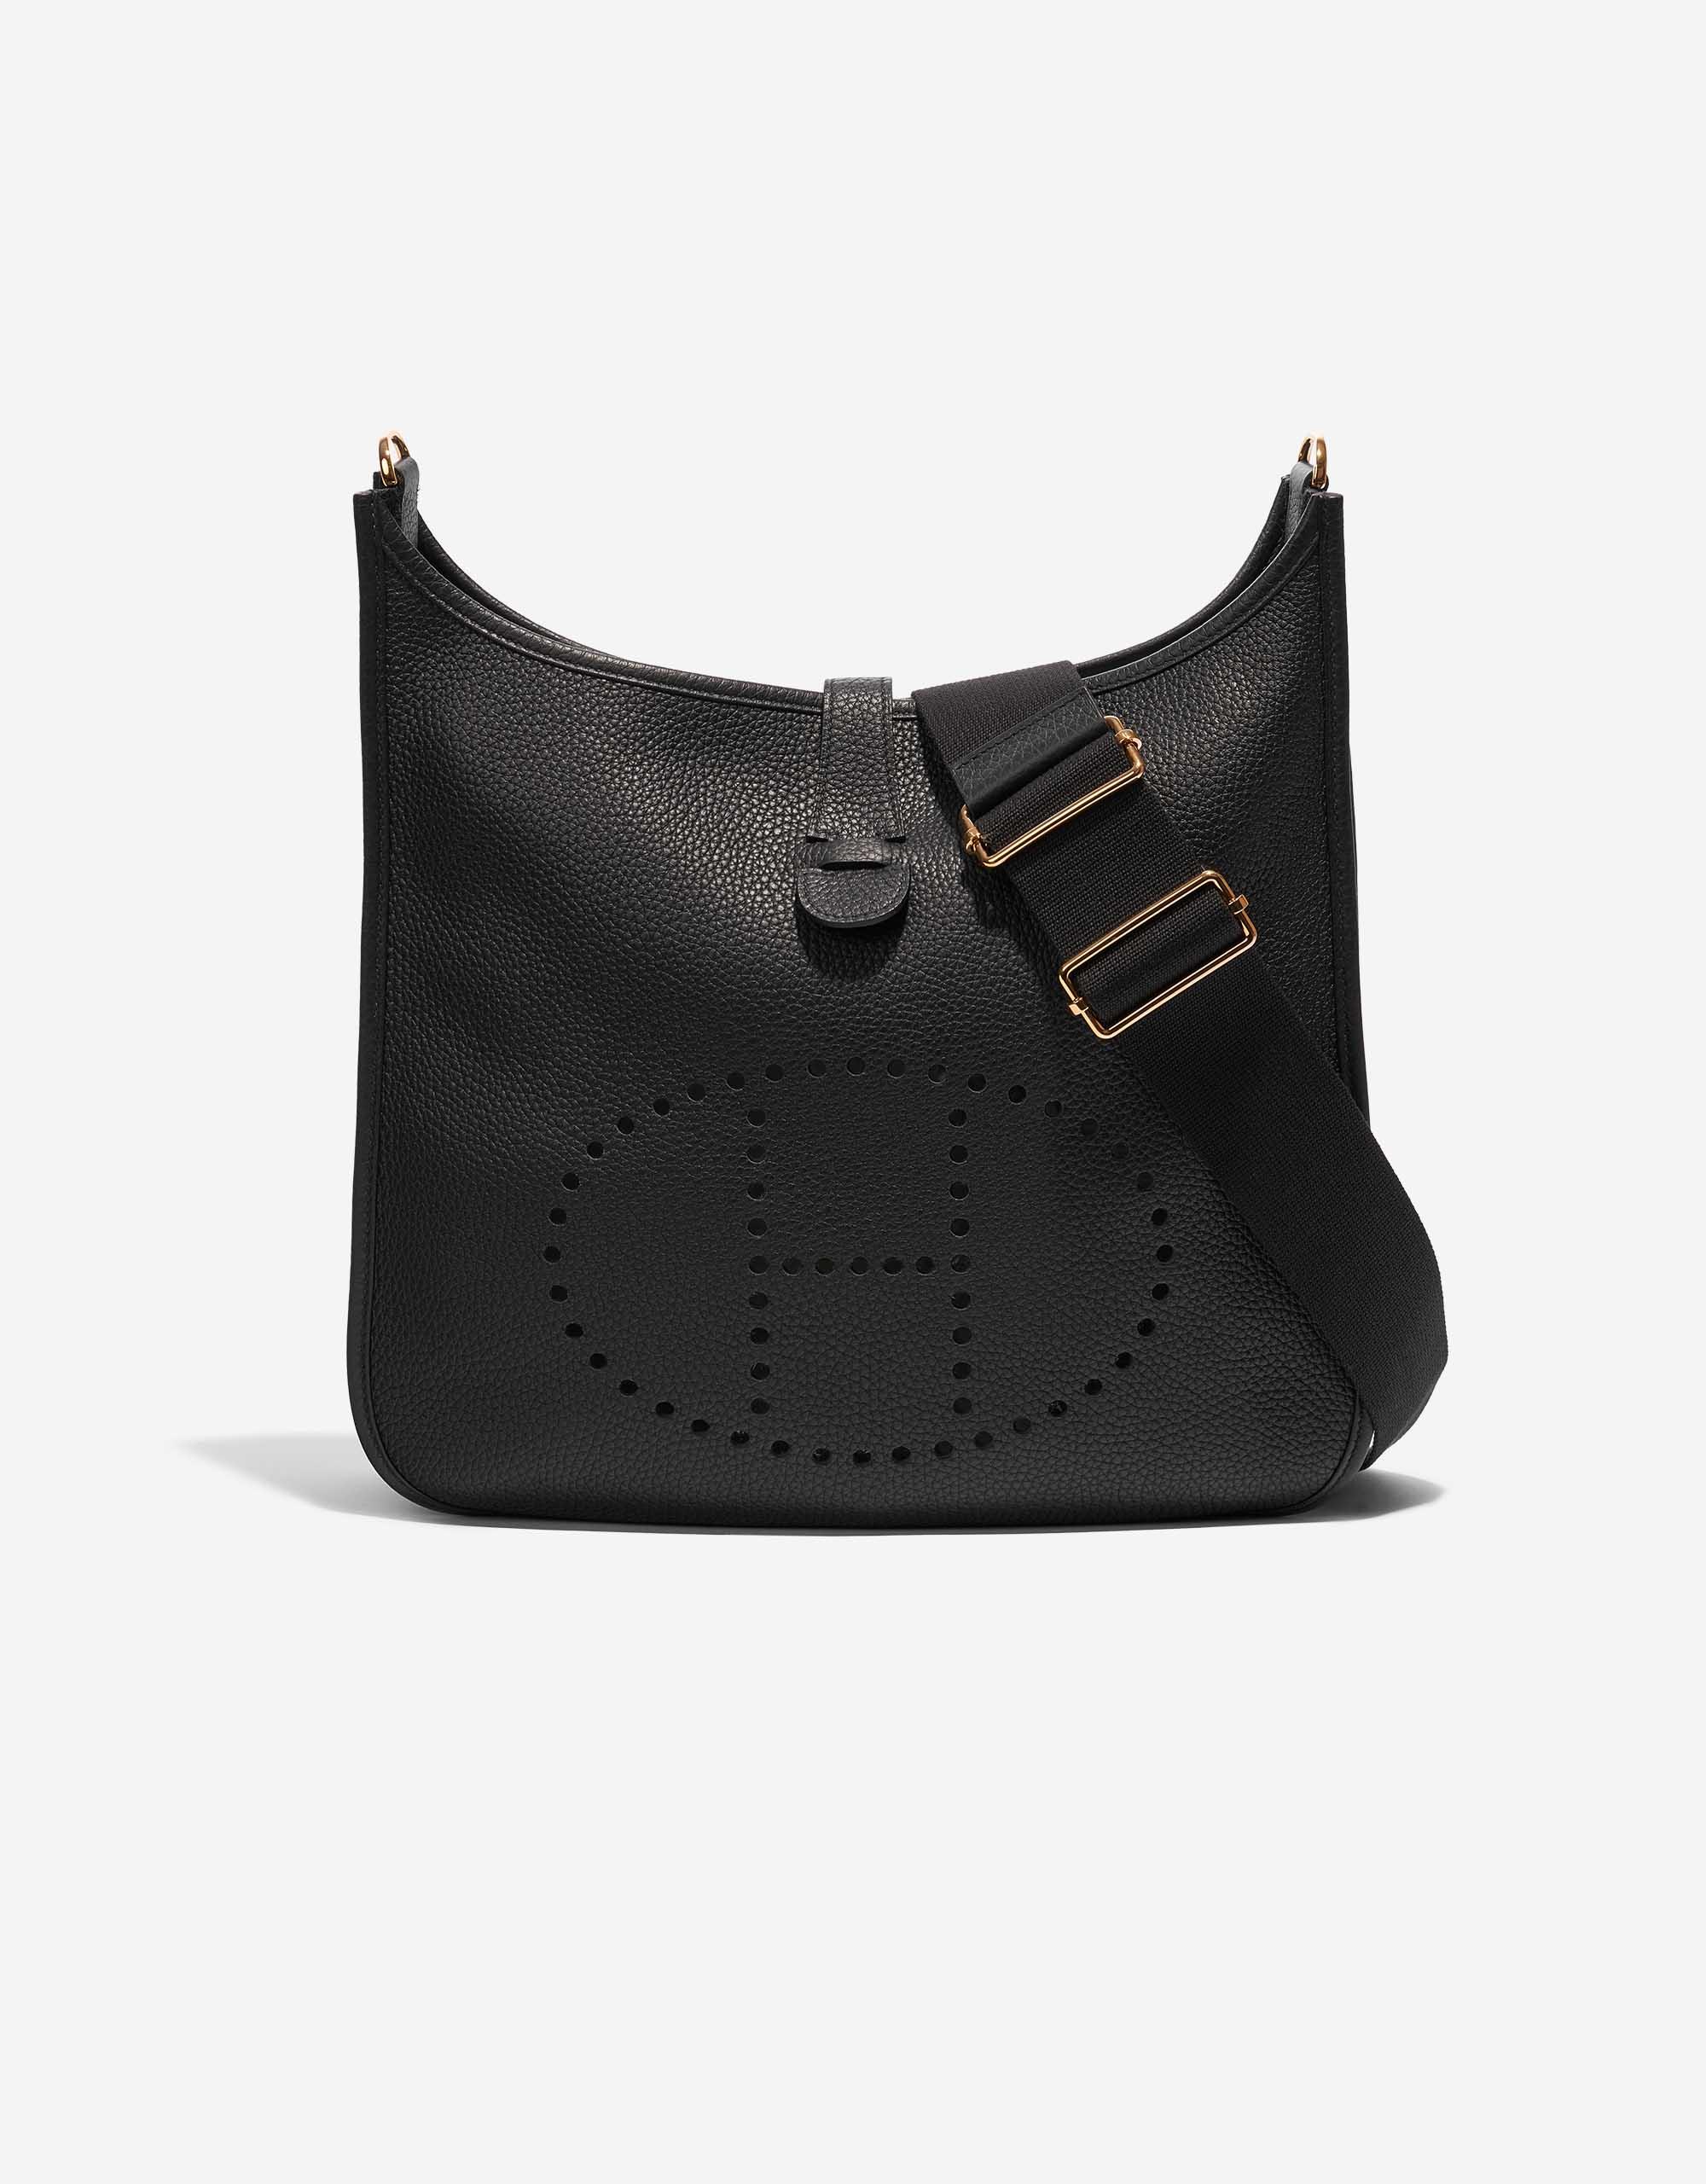 Hermès Evelyne 33 Taurillon Clemence Black | SACLÀB